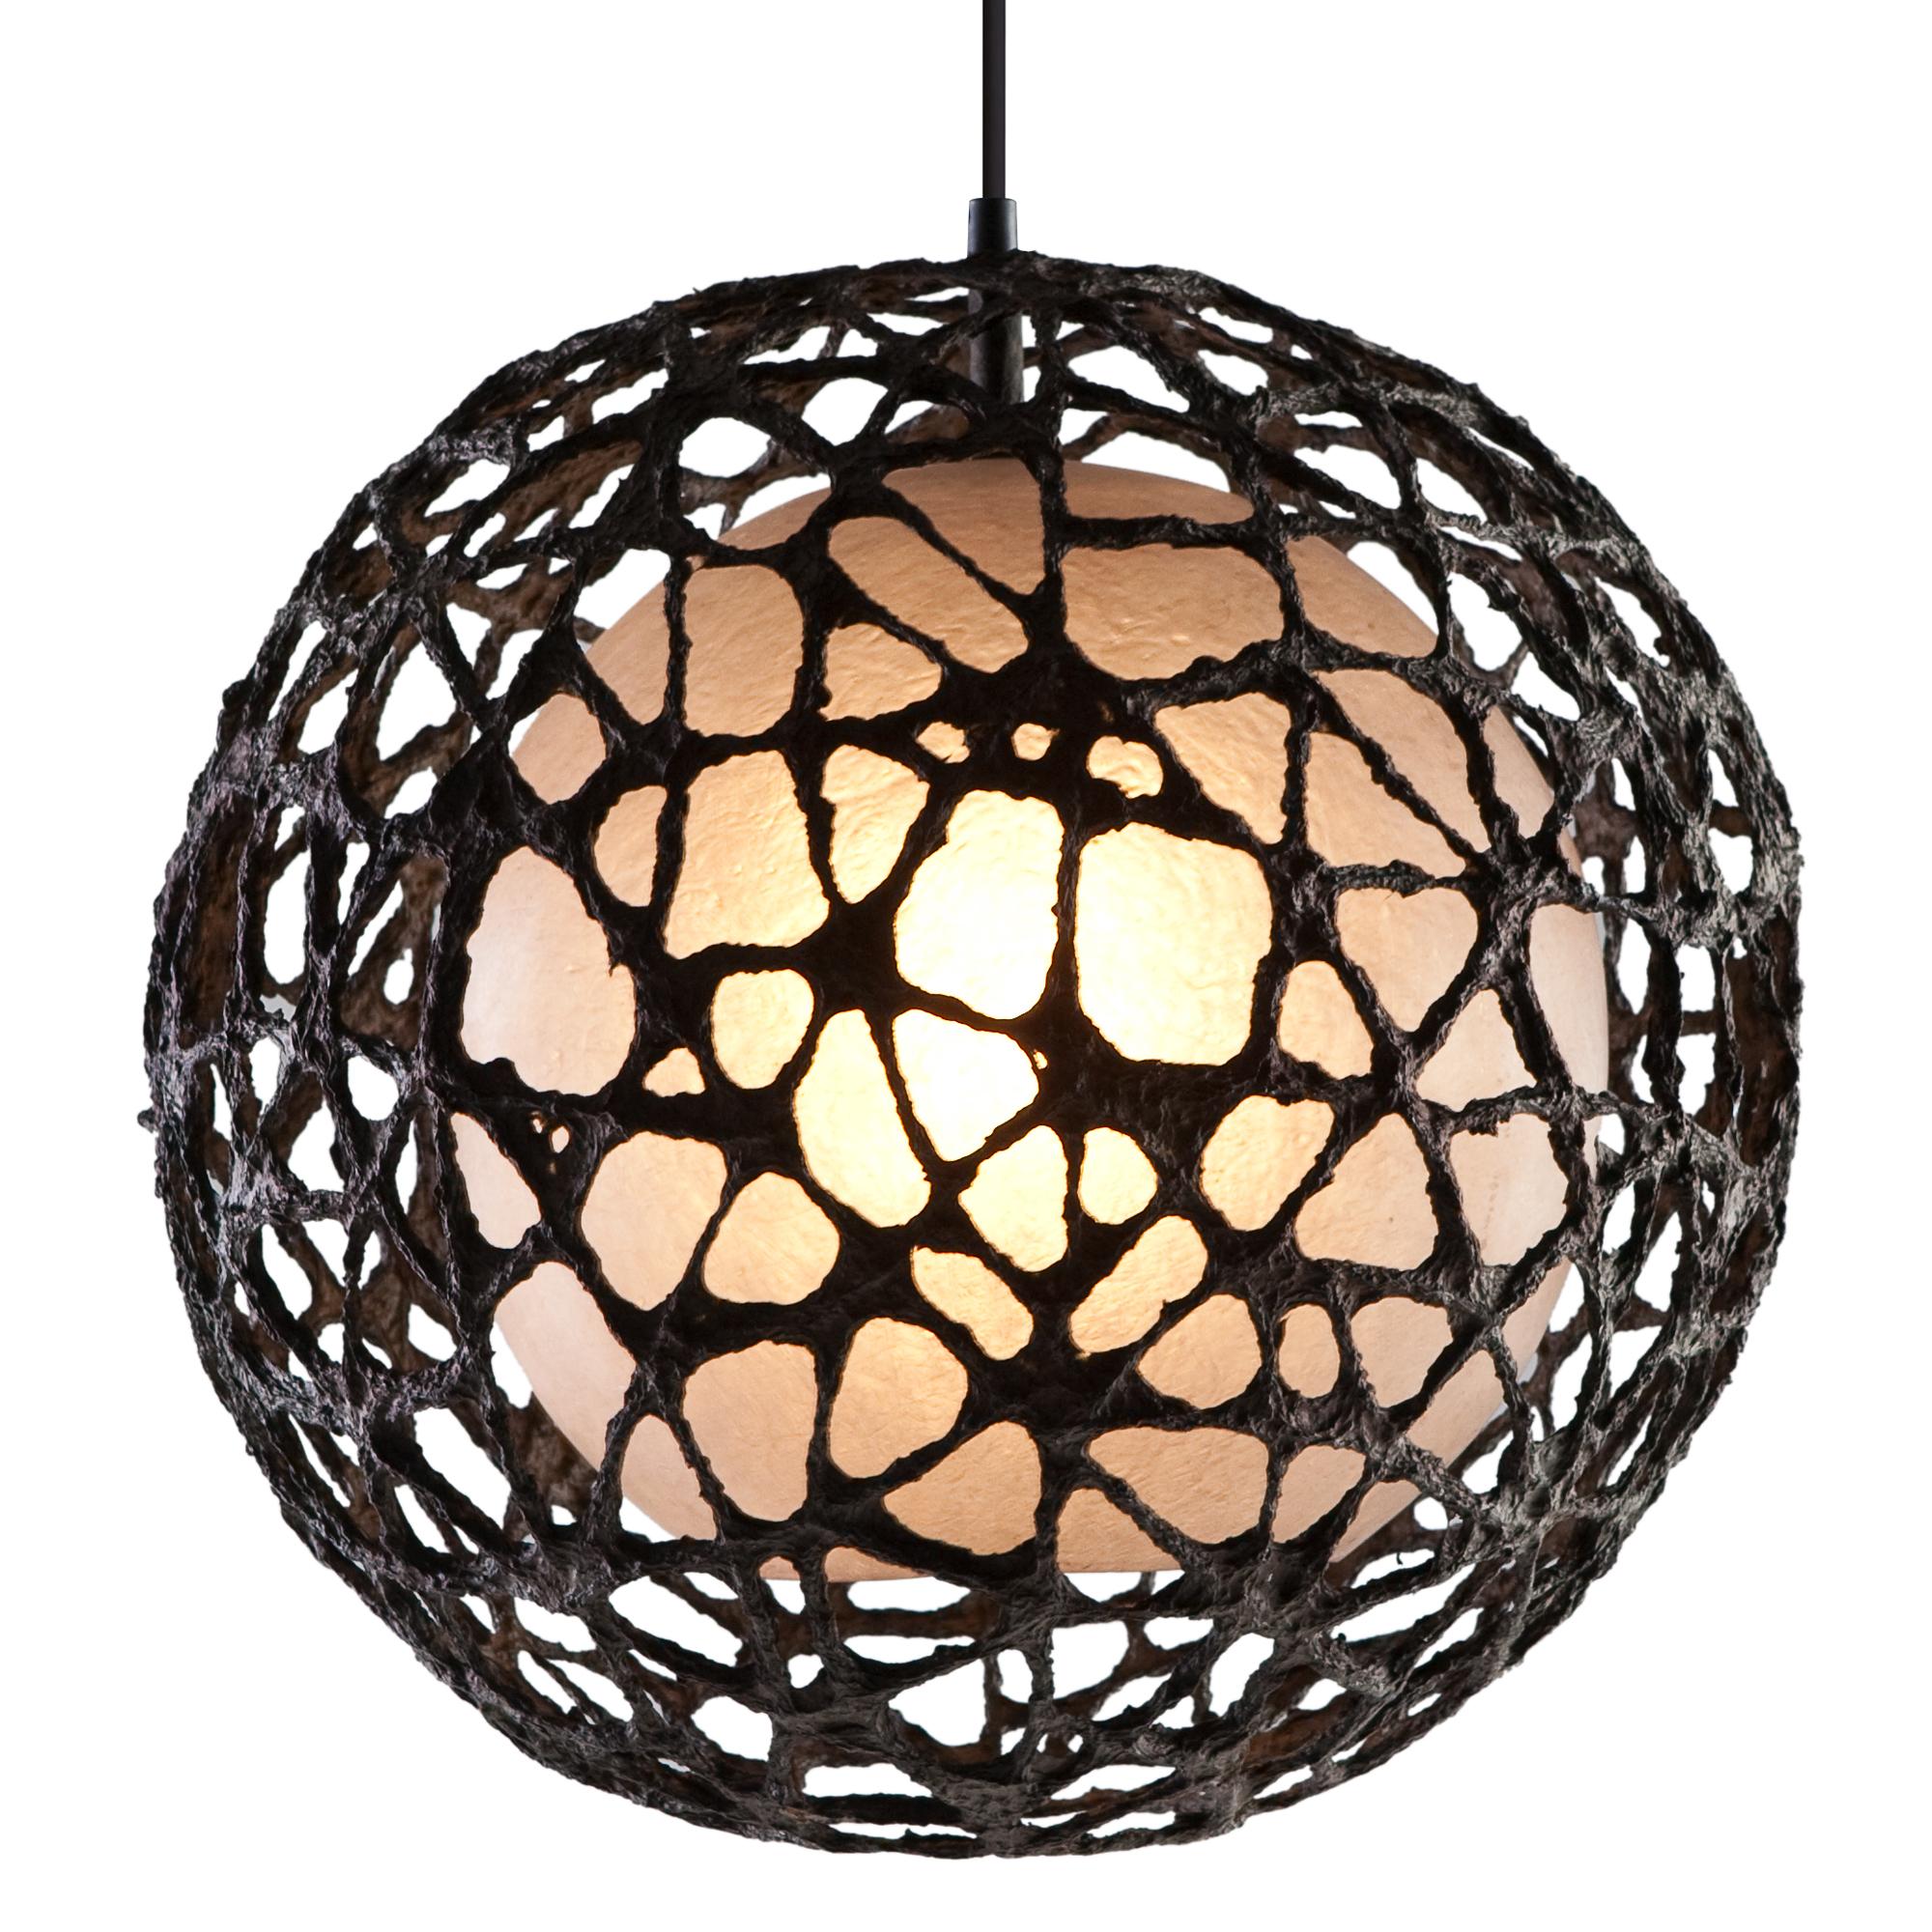 Round Hanging Light: C-U C-ME Round Pendant by Hive | LPCC-1515,Lighting